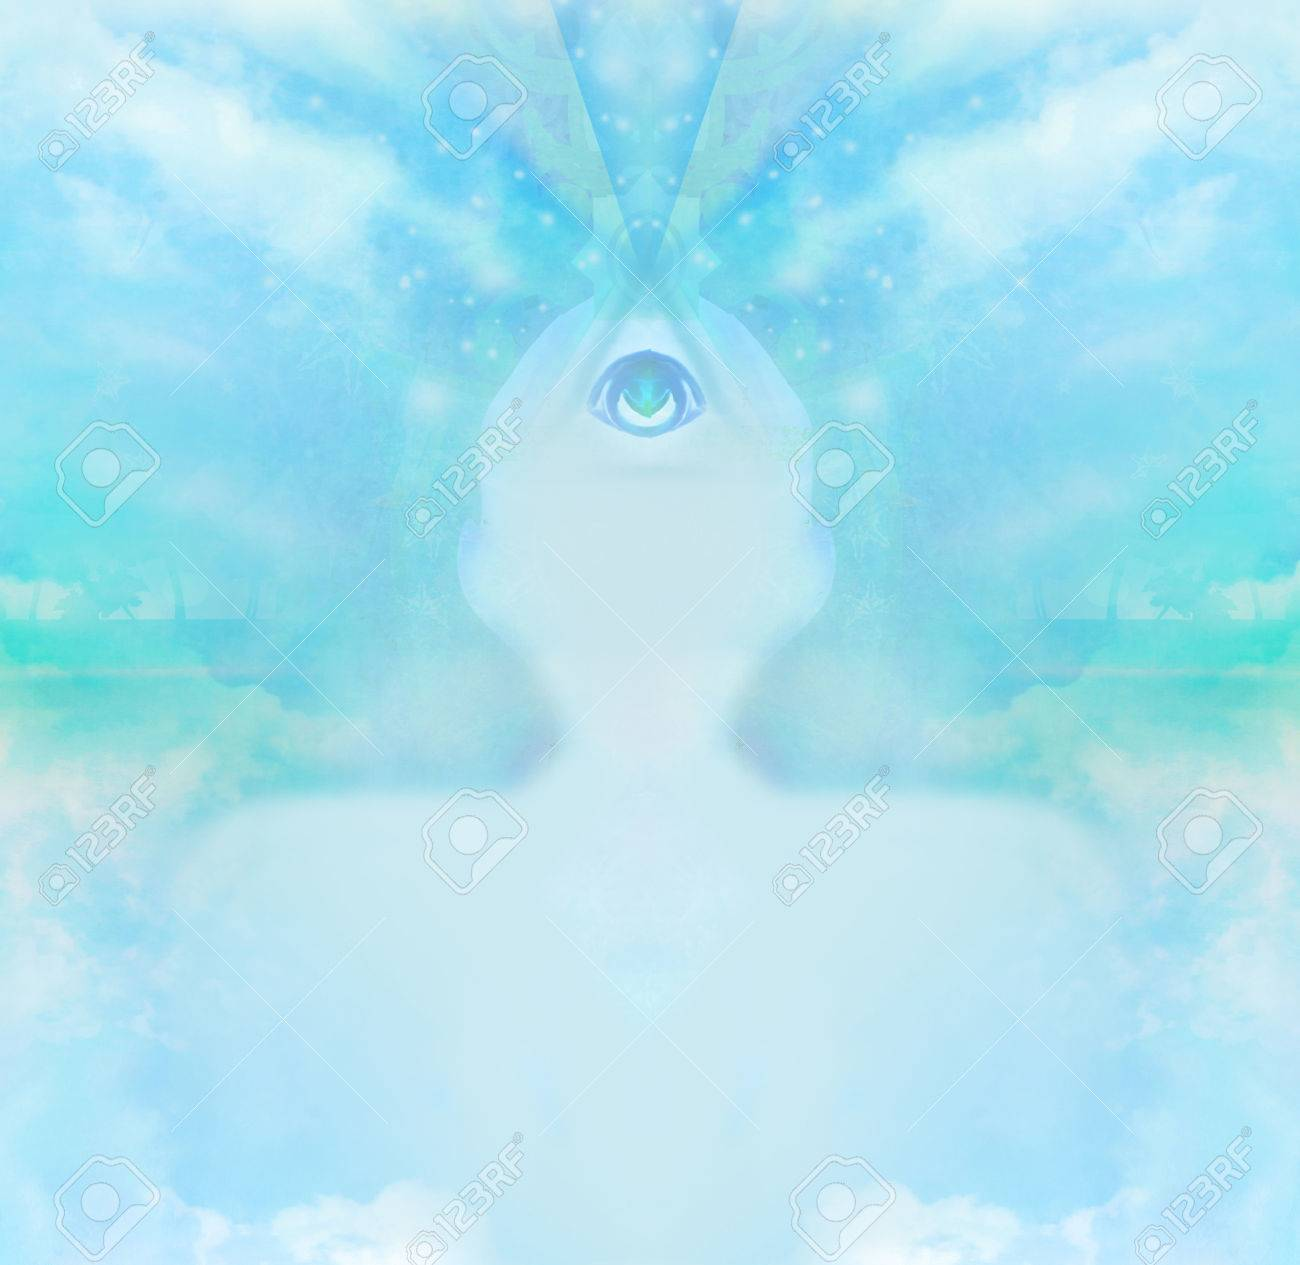 man with third eye, psychic supernatural senses - 62189184